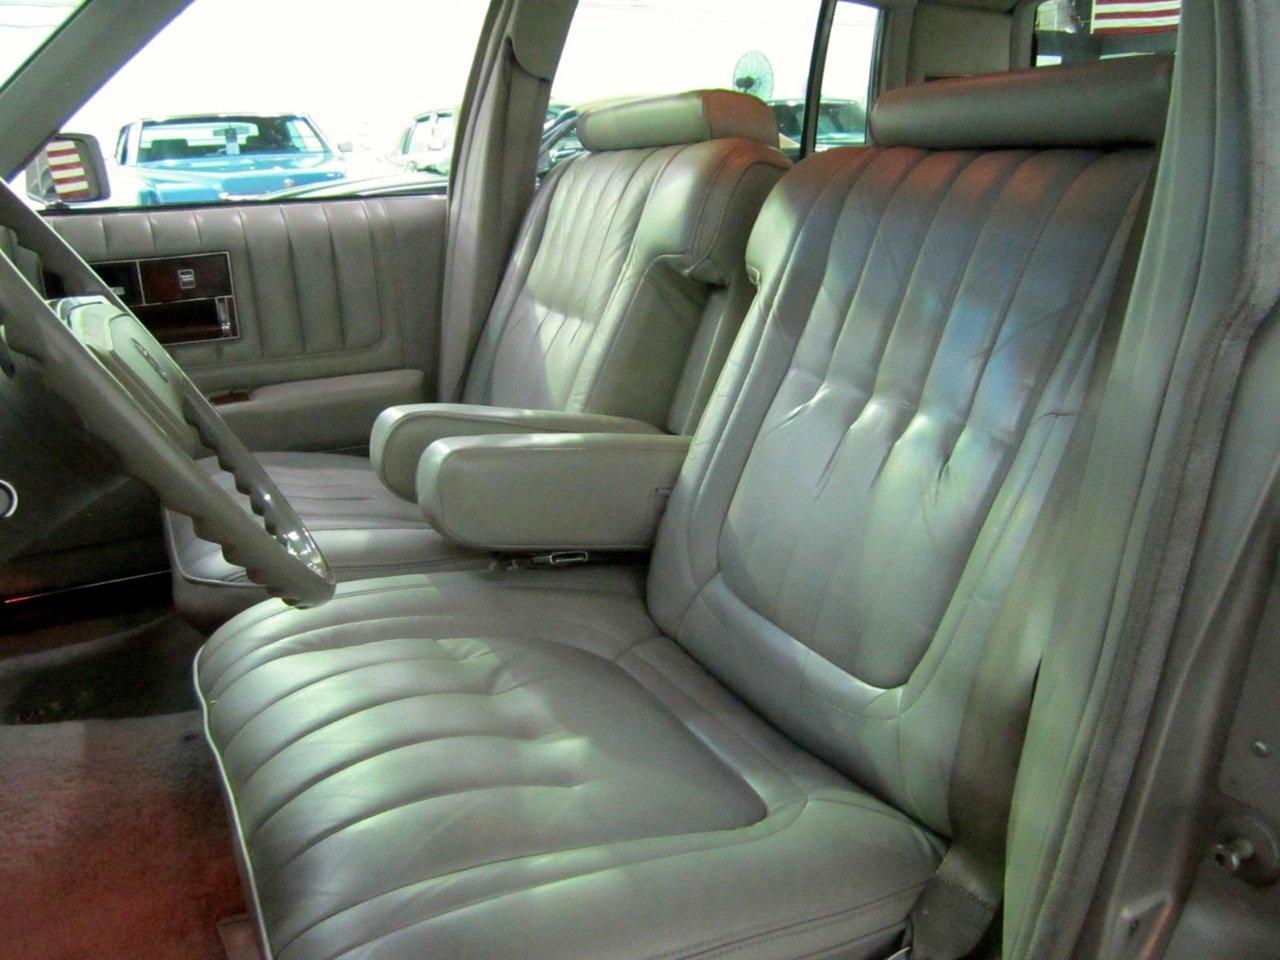 1978 Cadillac Seville Pedigree Motorcars Deville Hub Cap